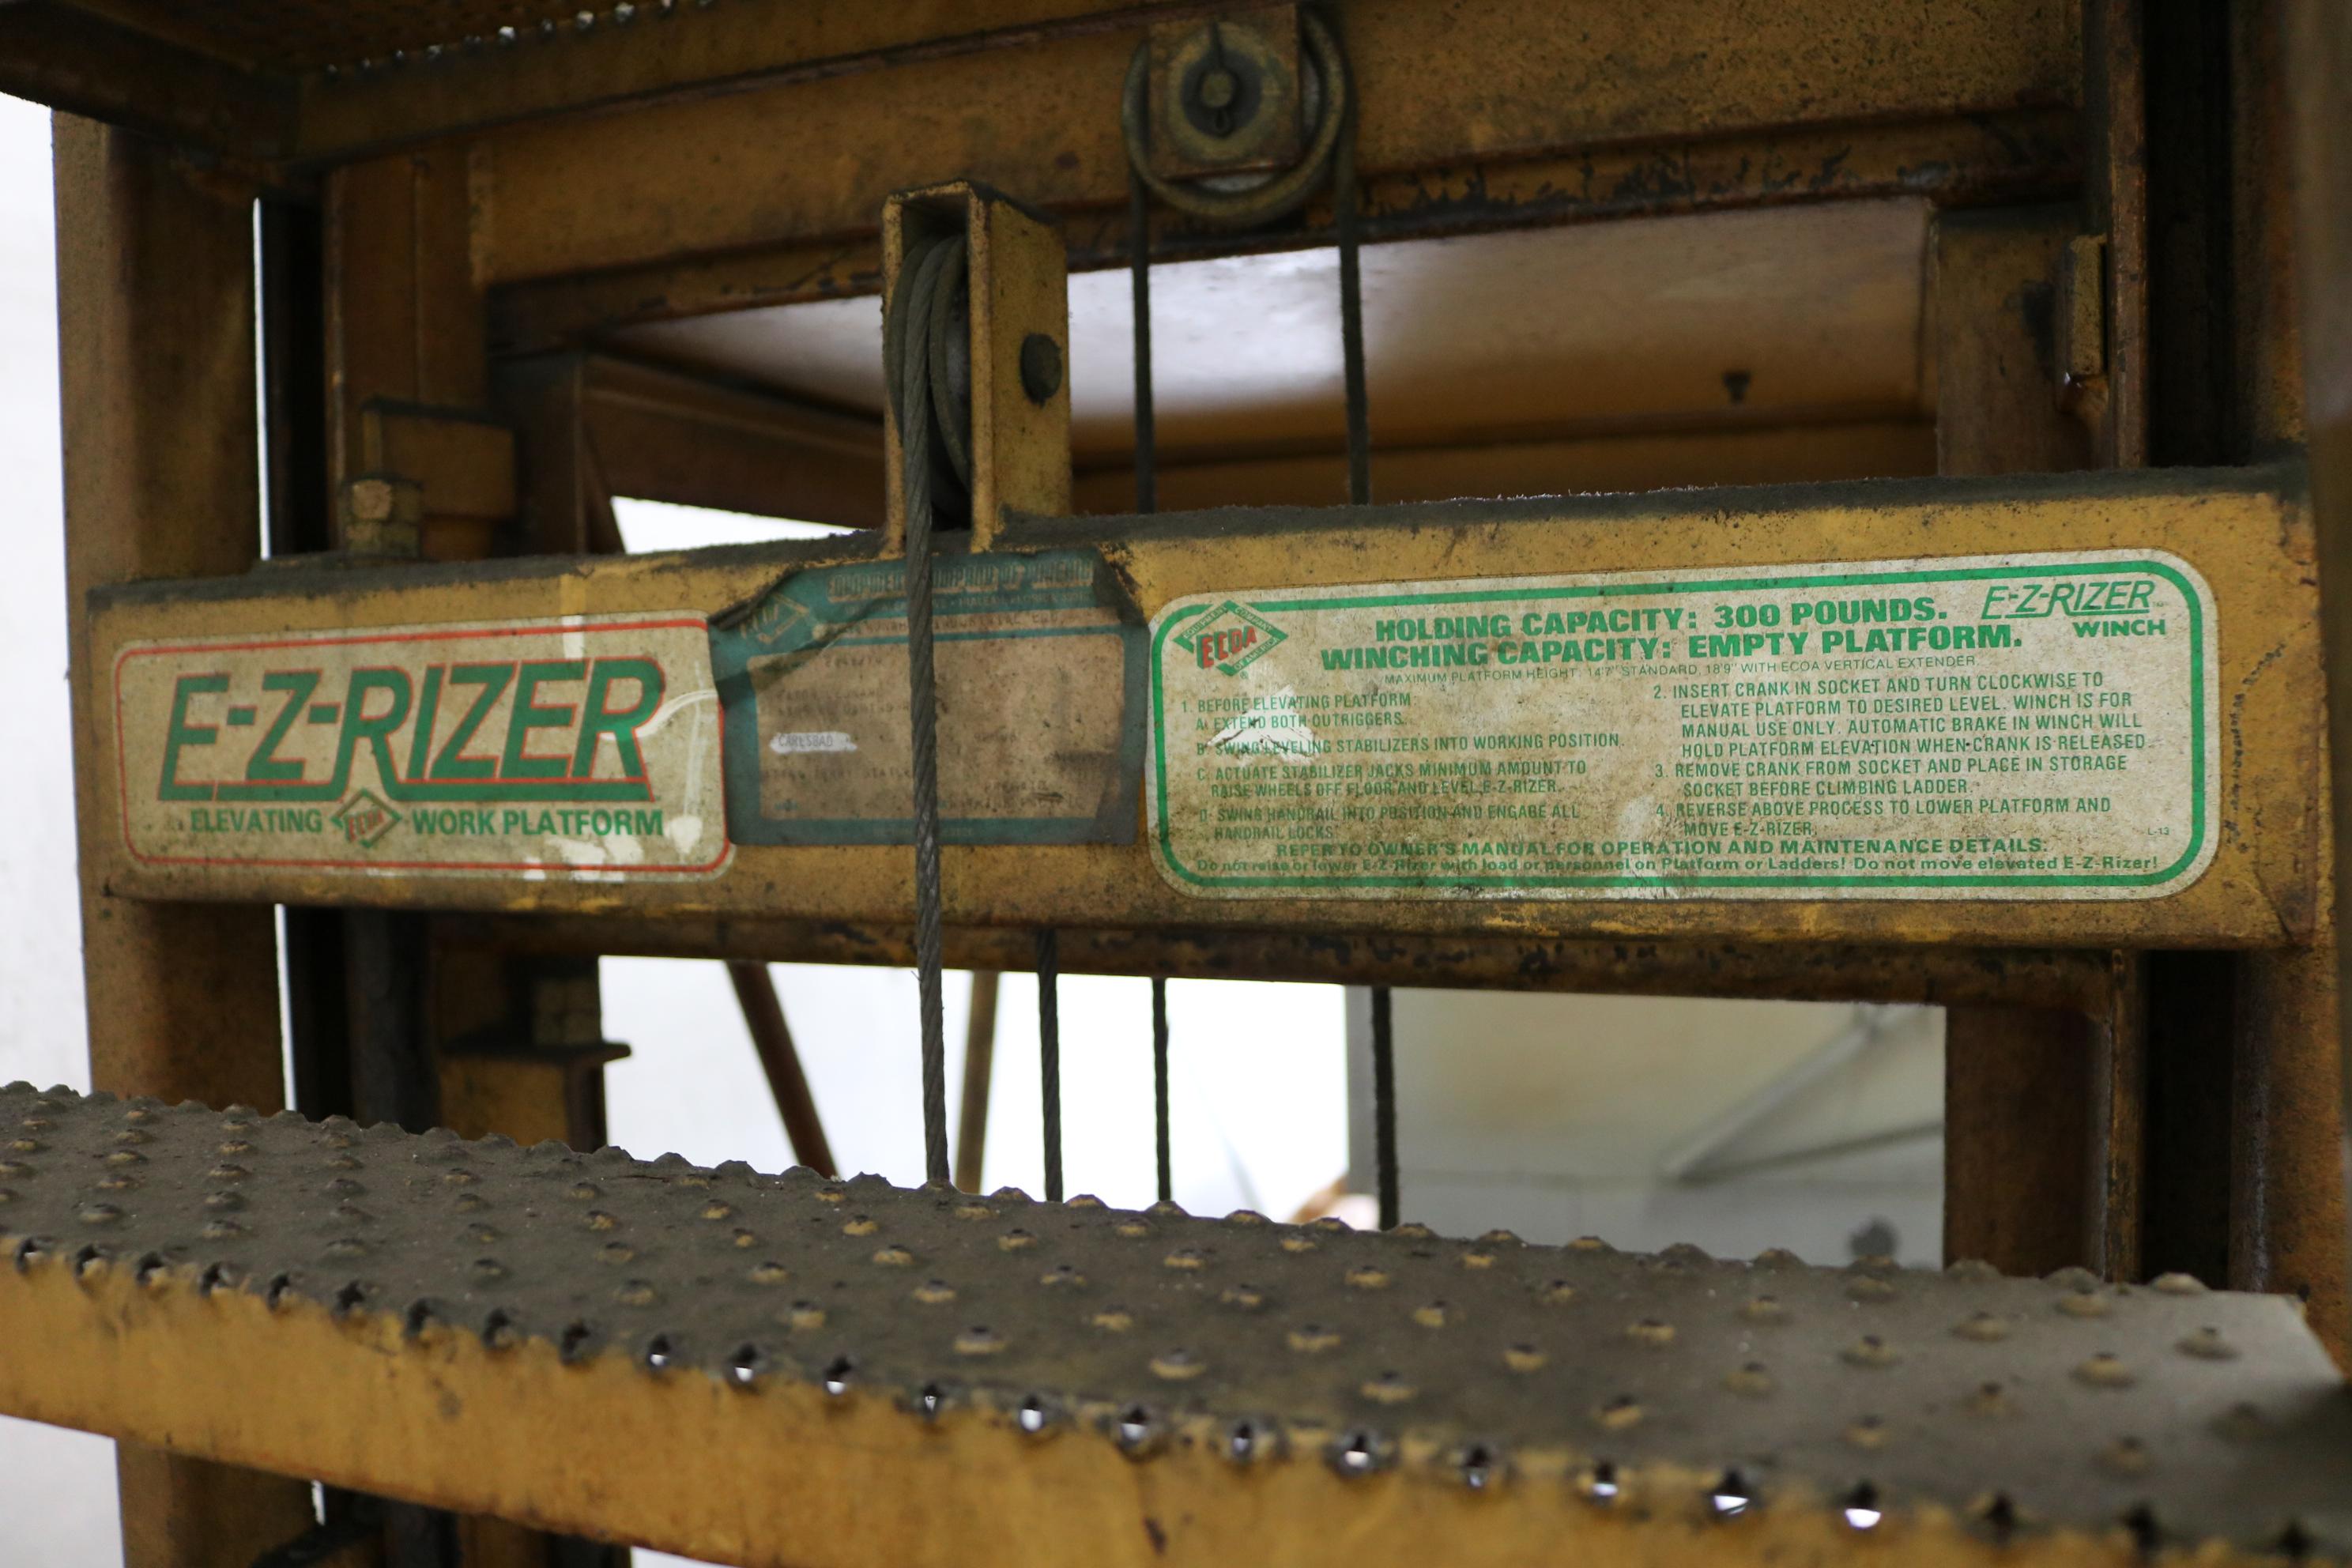 Lot 35 - E-Z RIZER ELEVATING WORK PLATFORM, PORTABLE